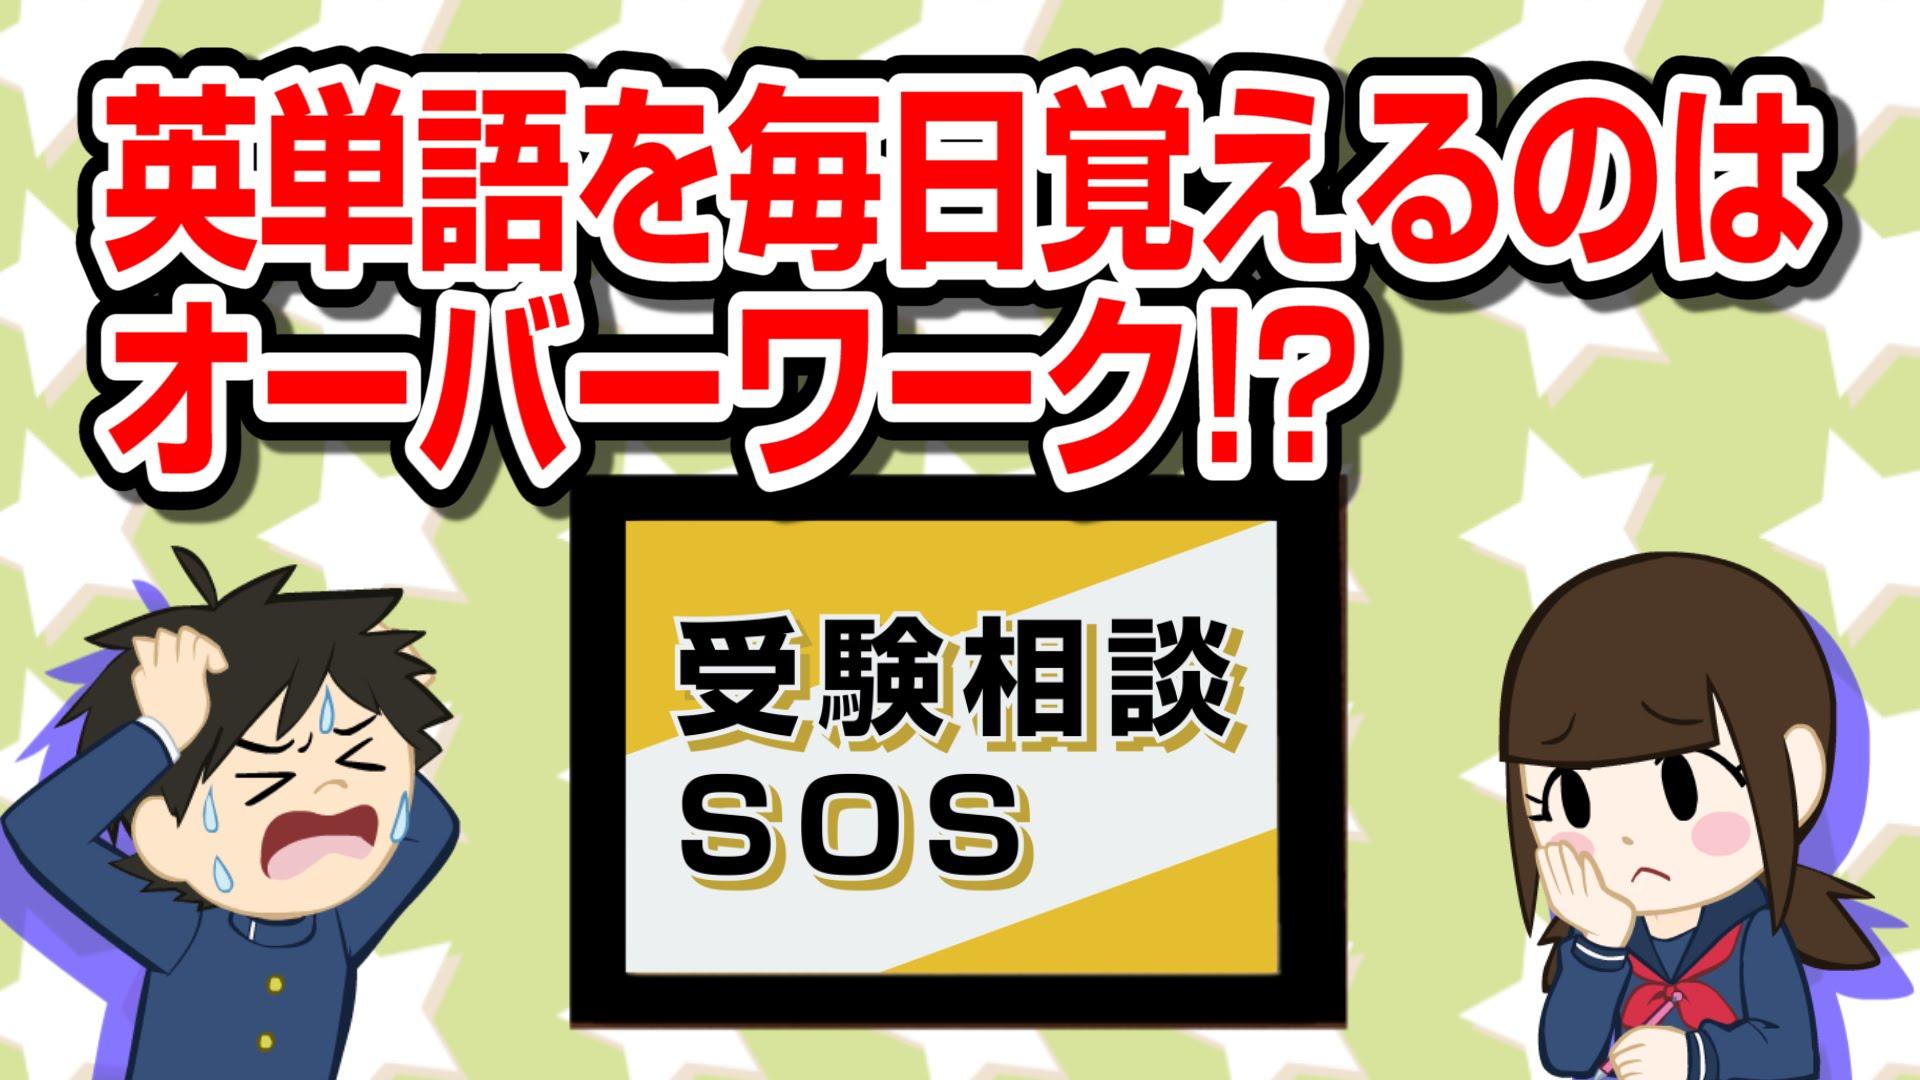 【vol.99】英単語は毎日やれ!? 受験相談SOS